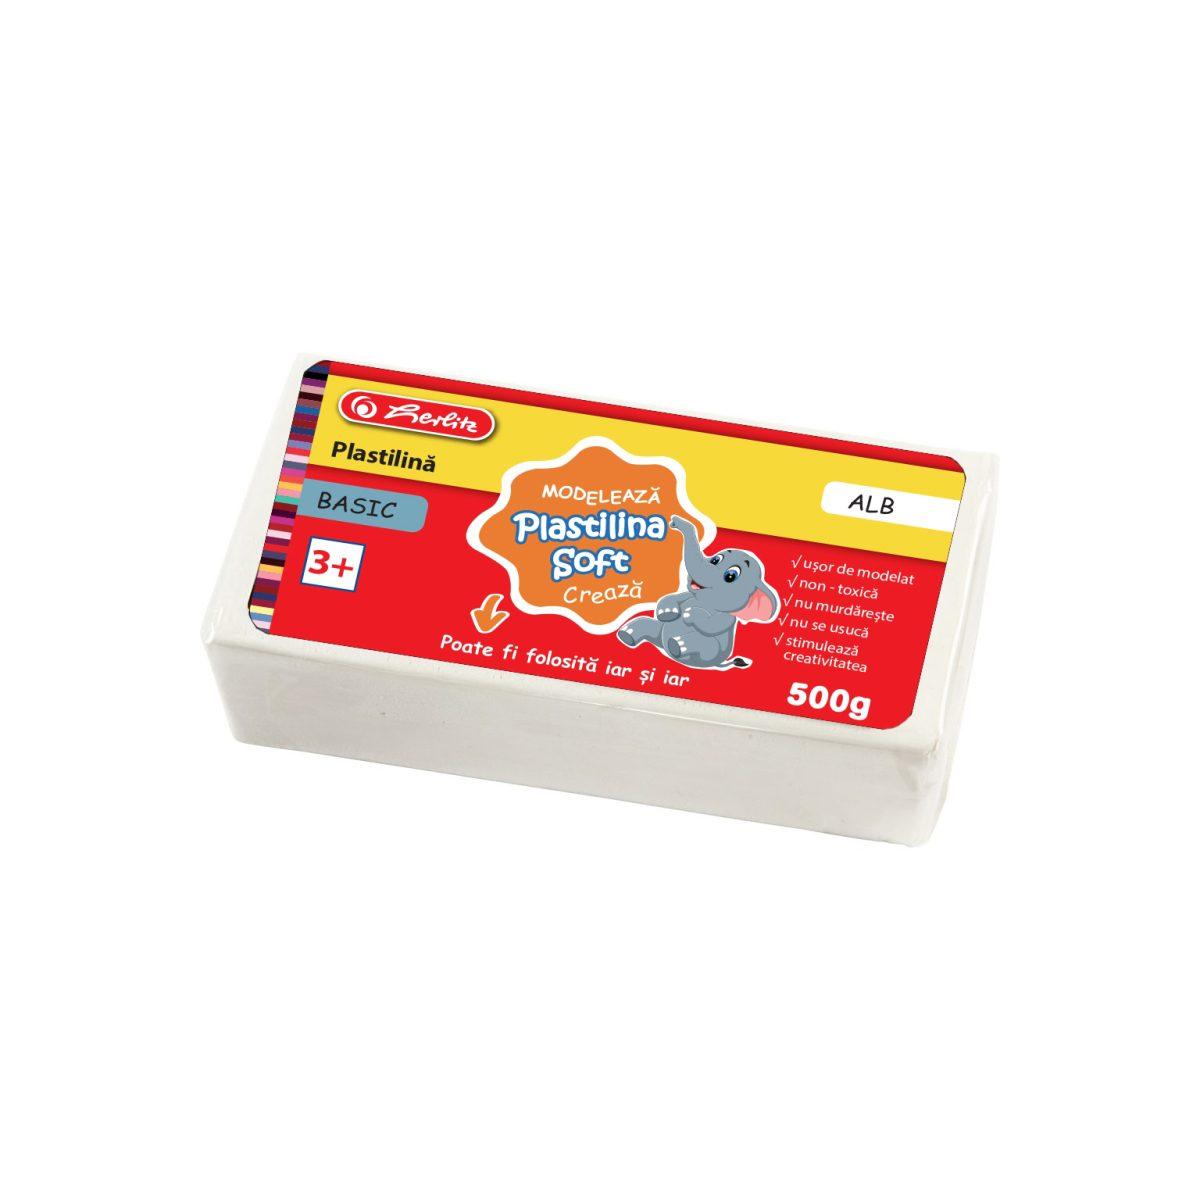 Plastilină Soft Clay, 500 Grame, Diferite Culori, Basic, Herlitz